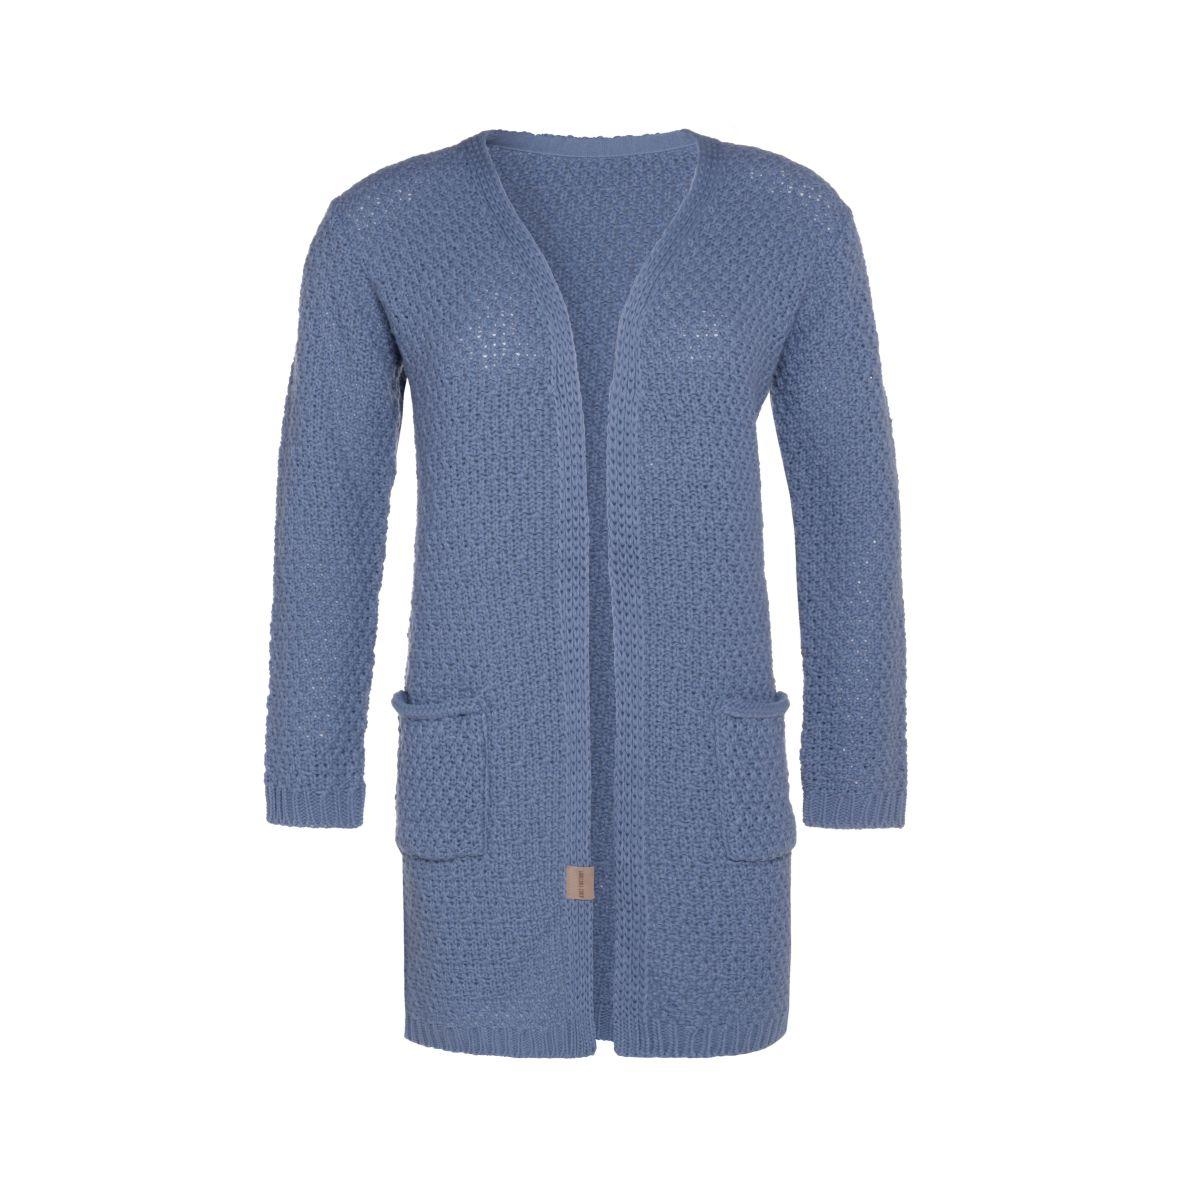 knit factory kf13308103251 luna vest indigo 4042 1